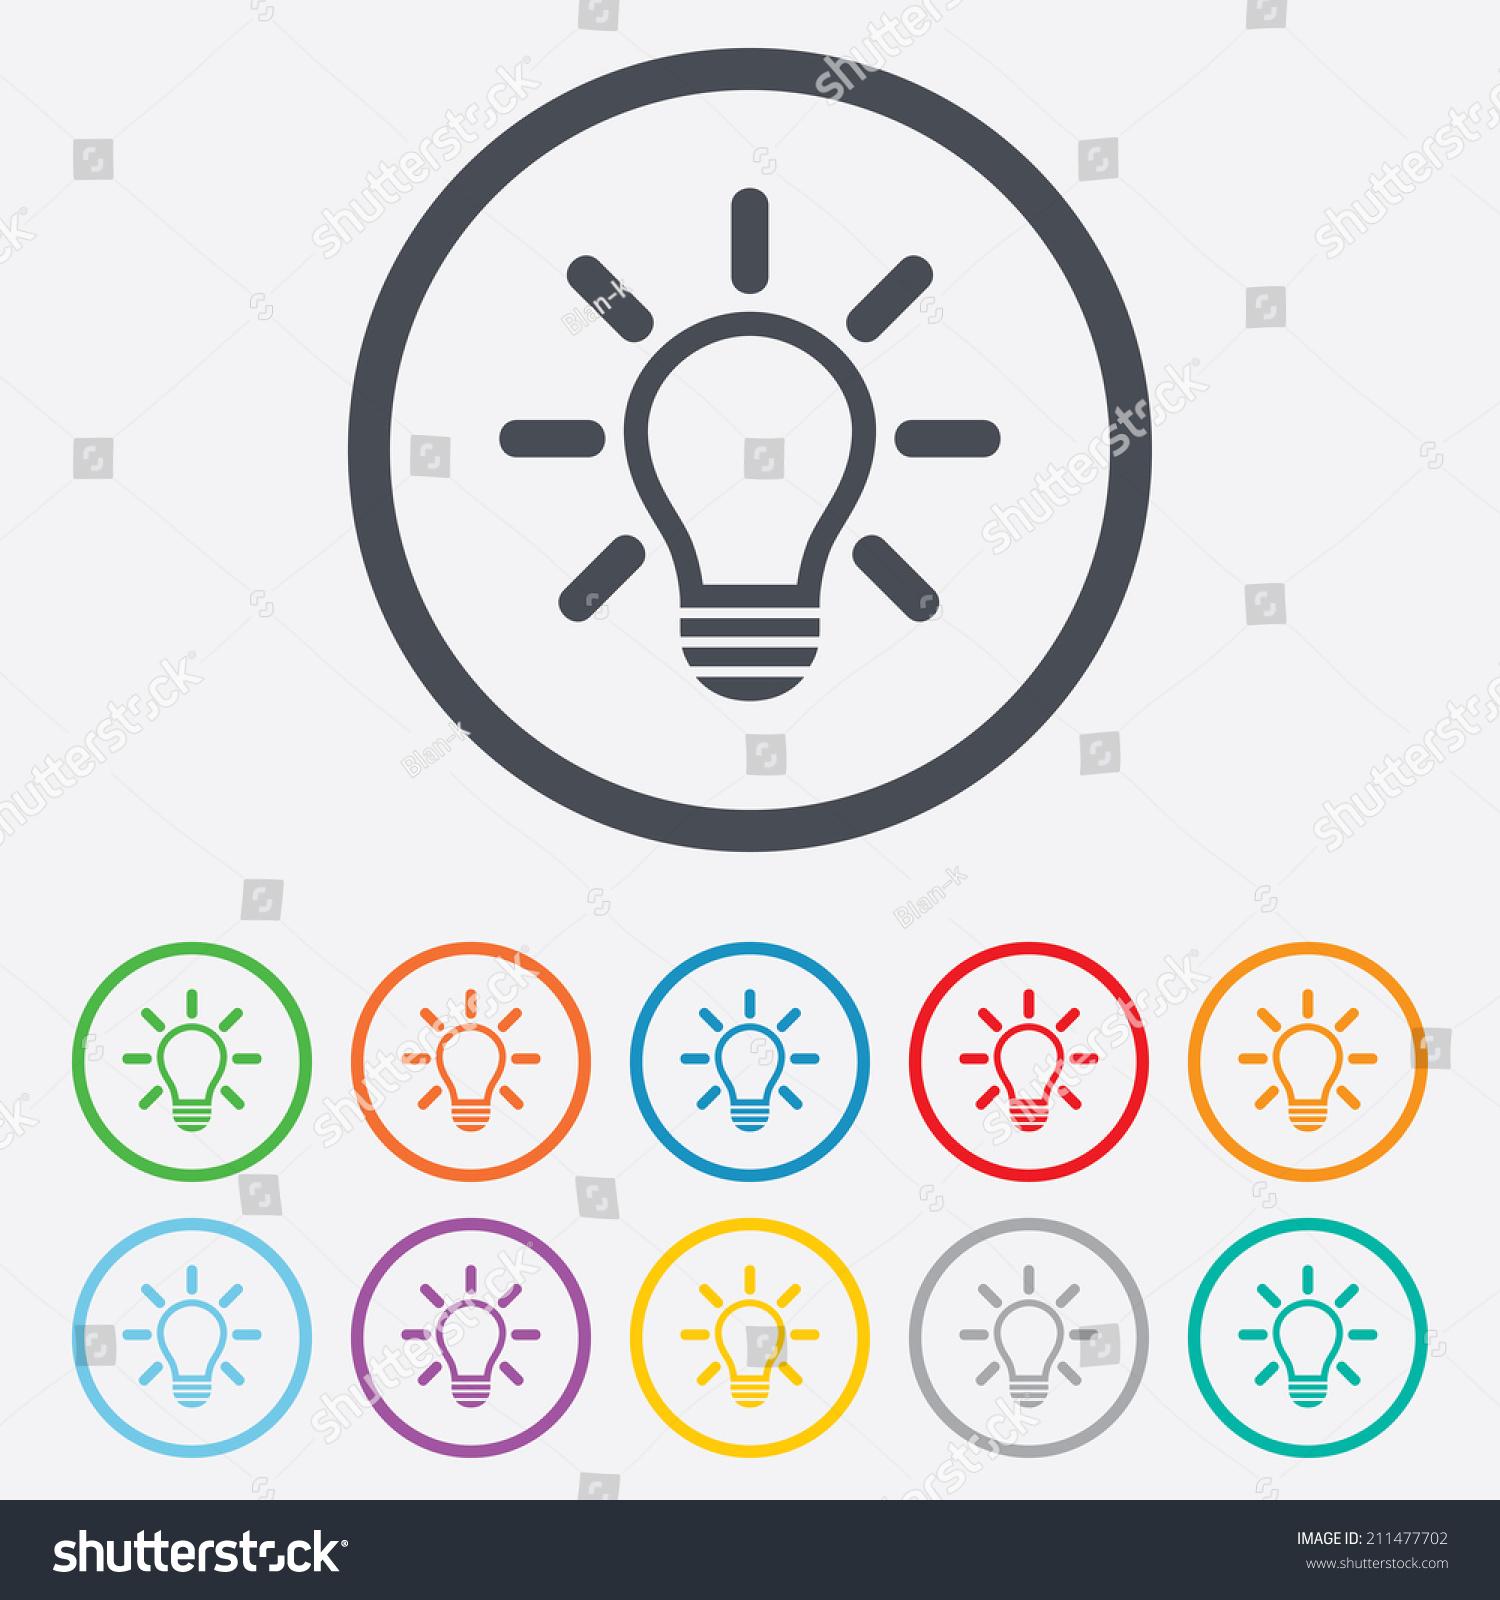 Light Lamp Sign Icon Idea Symbol Stock Vector 211477702 - Shutterstock